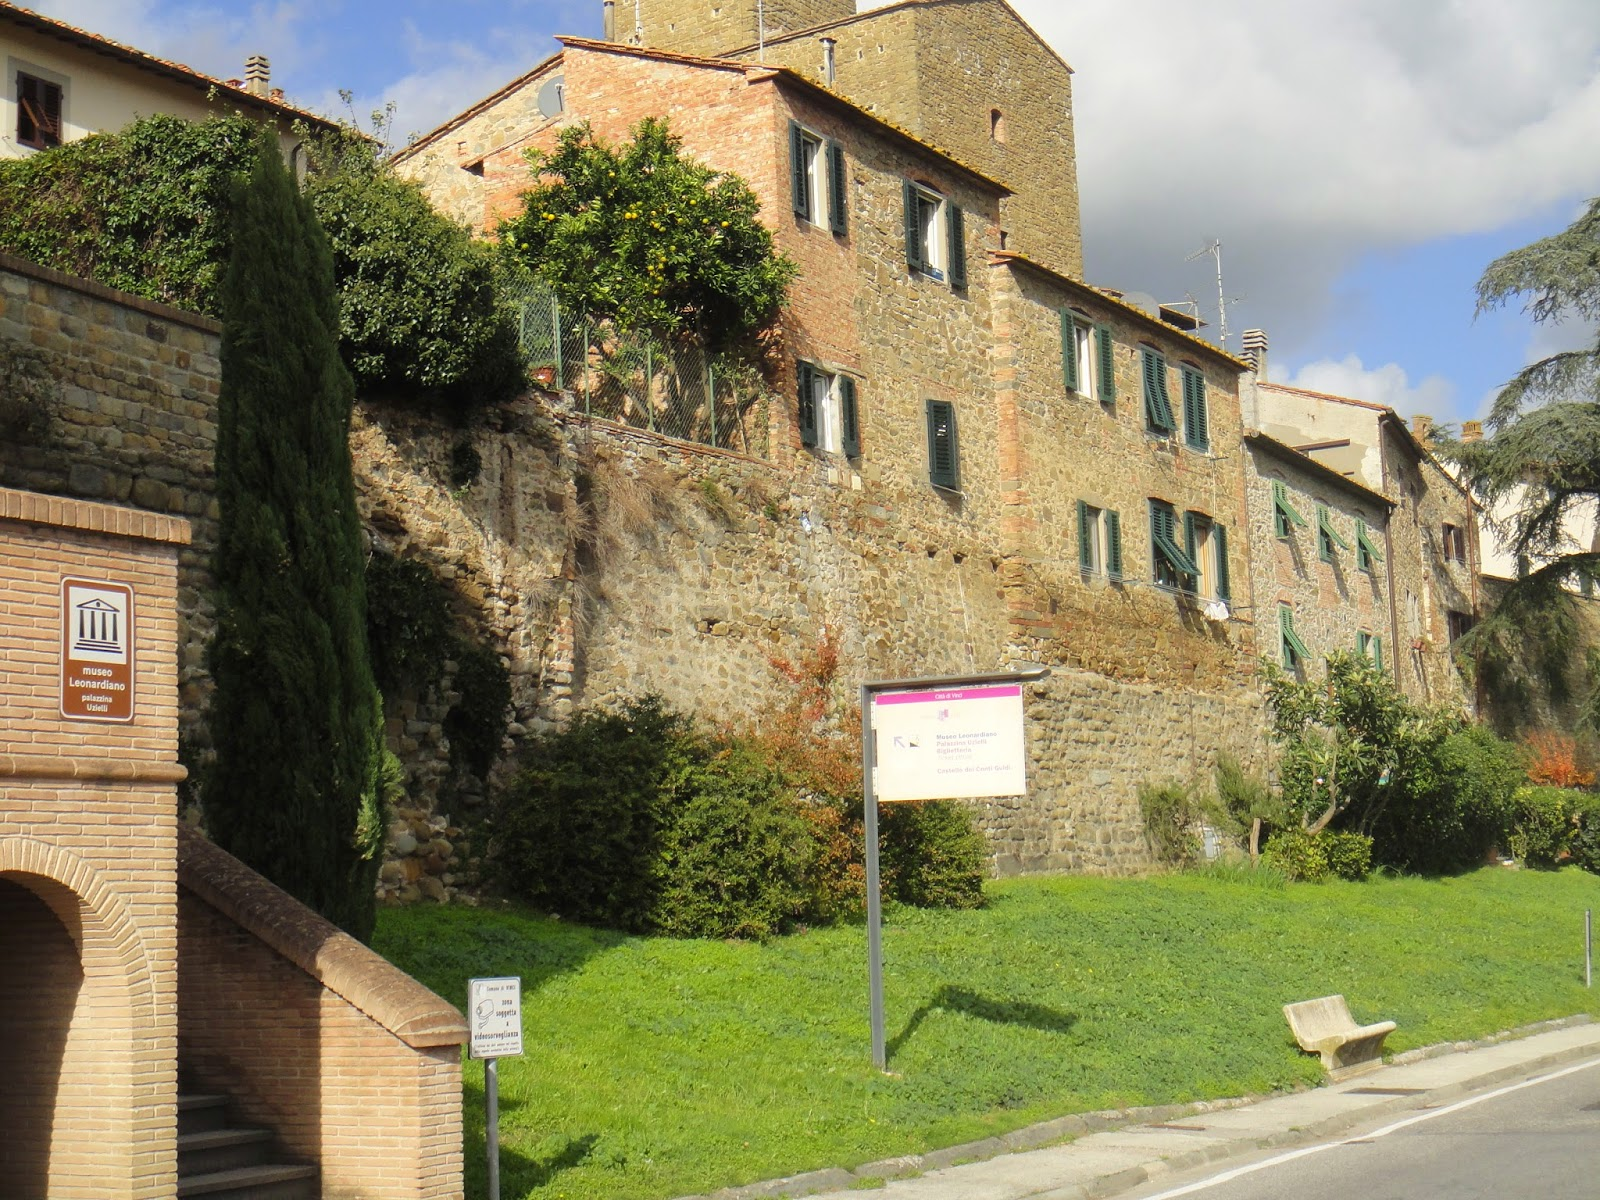 museu leonardiano em Vinci